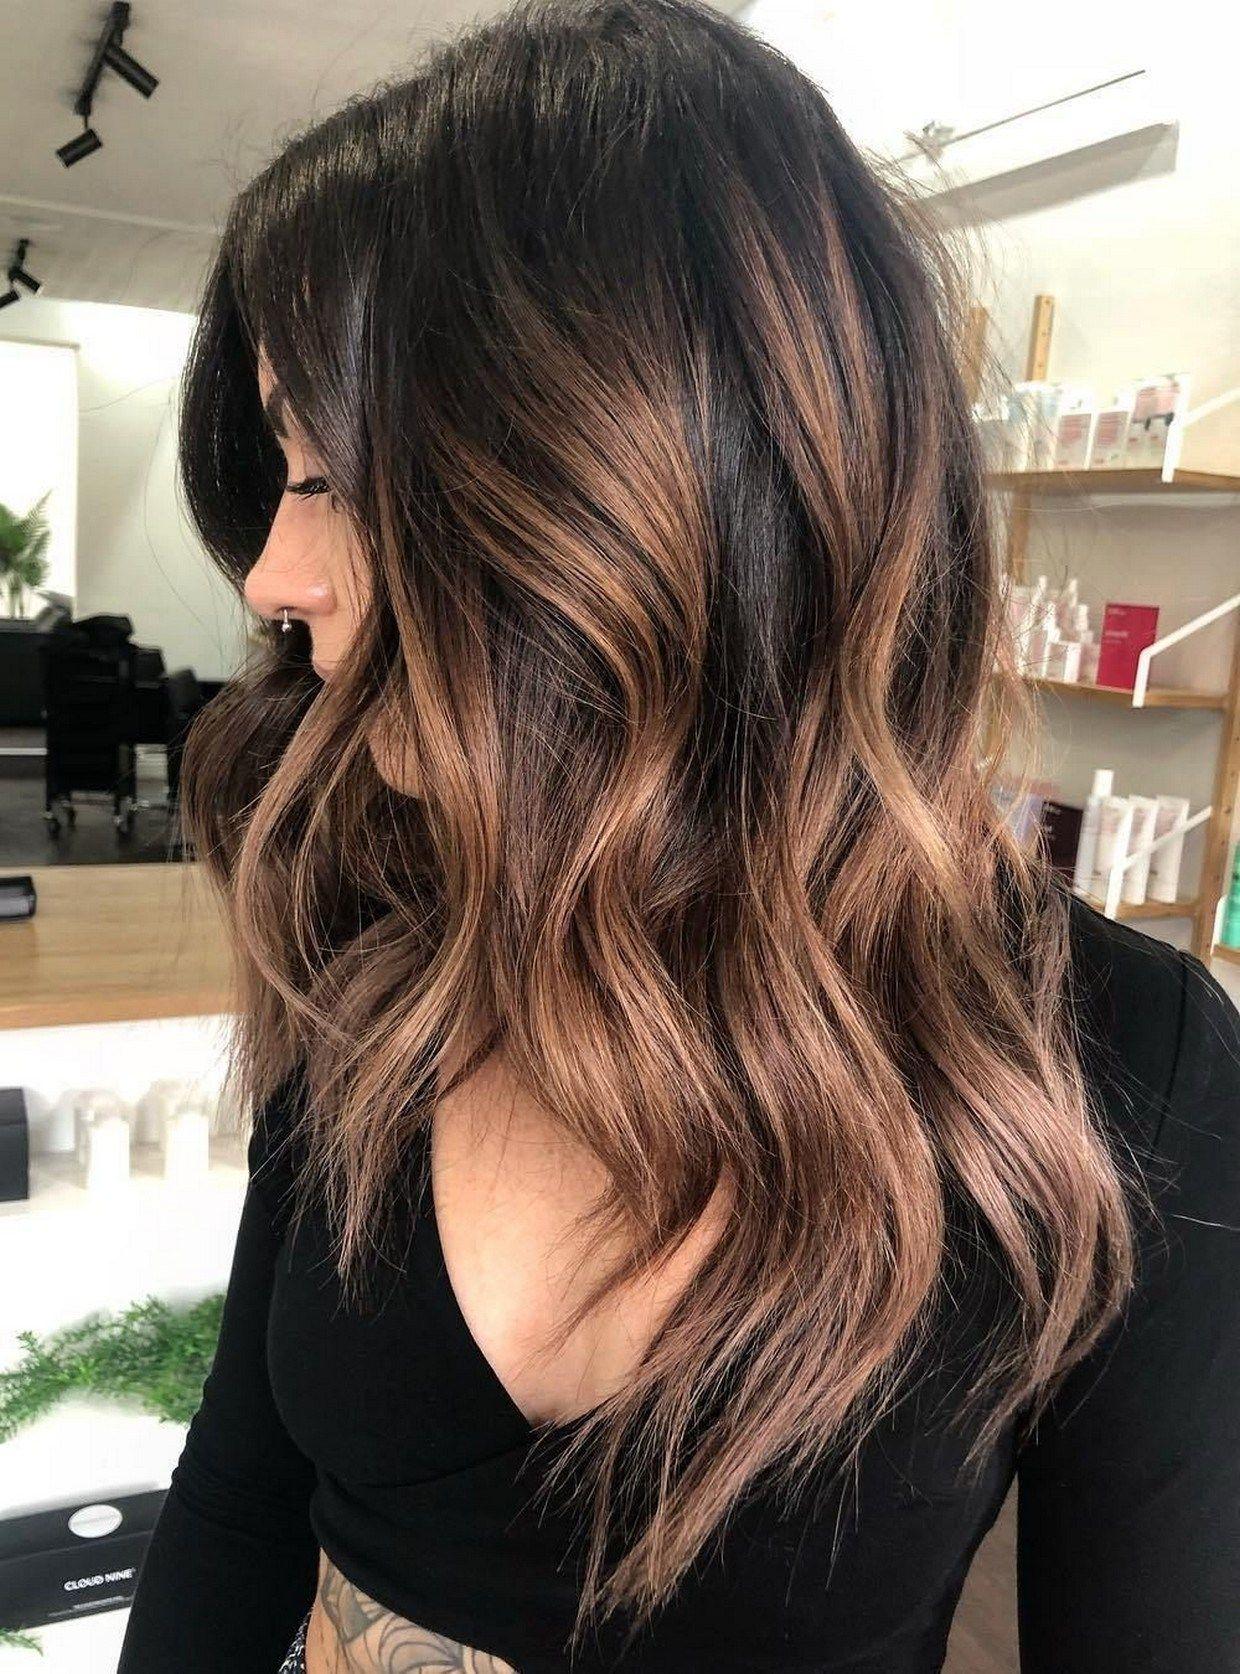 10 fall hair colour ideas for all hair types 2019 2020 16